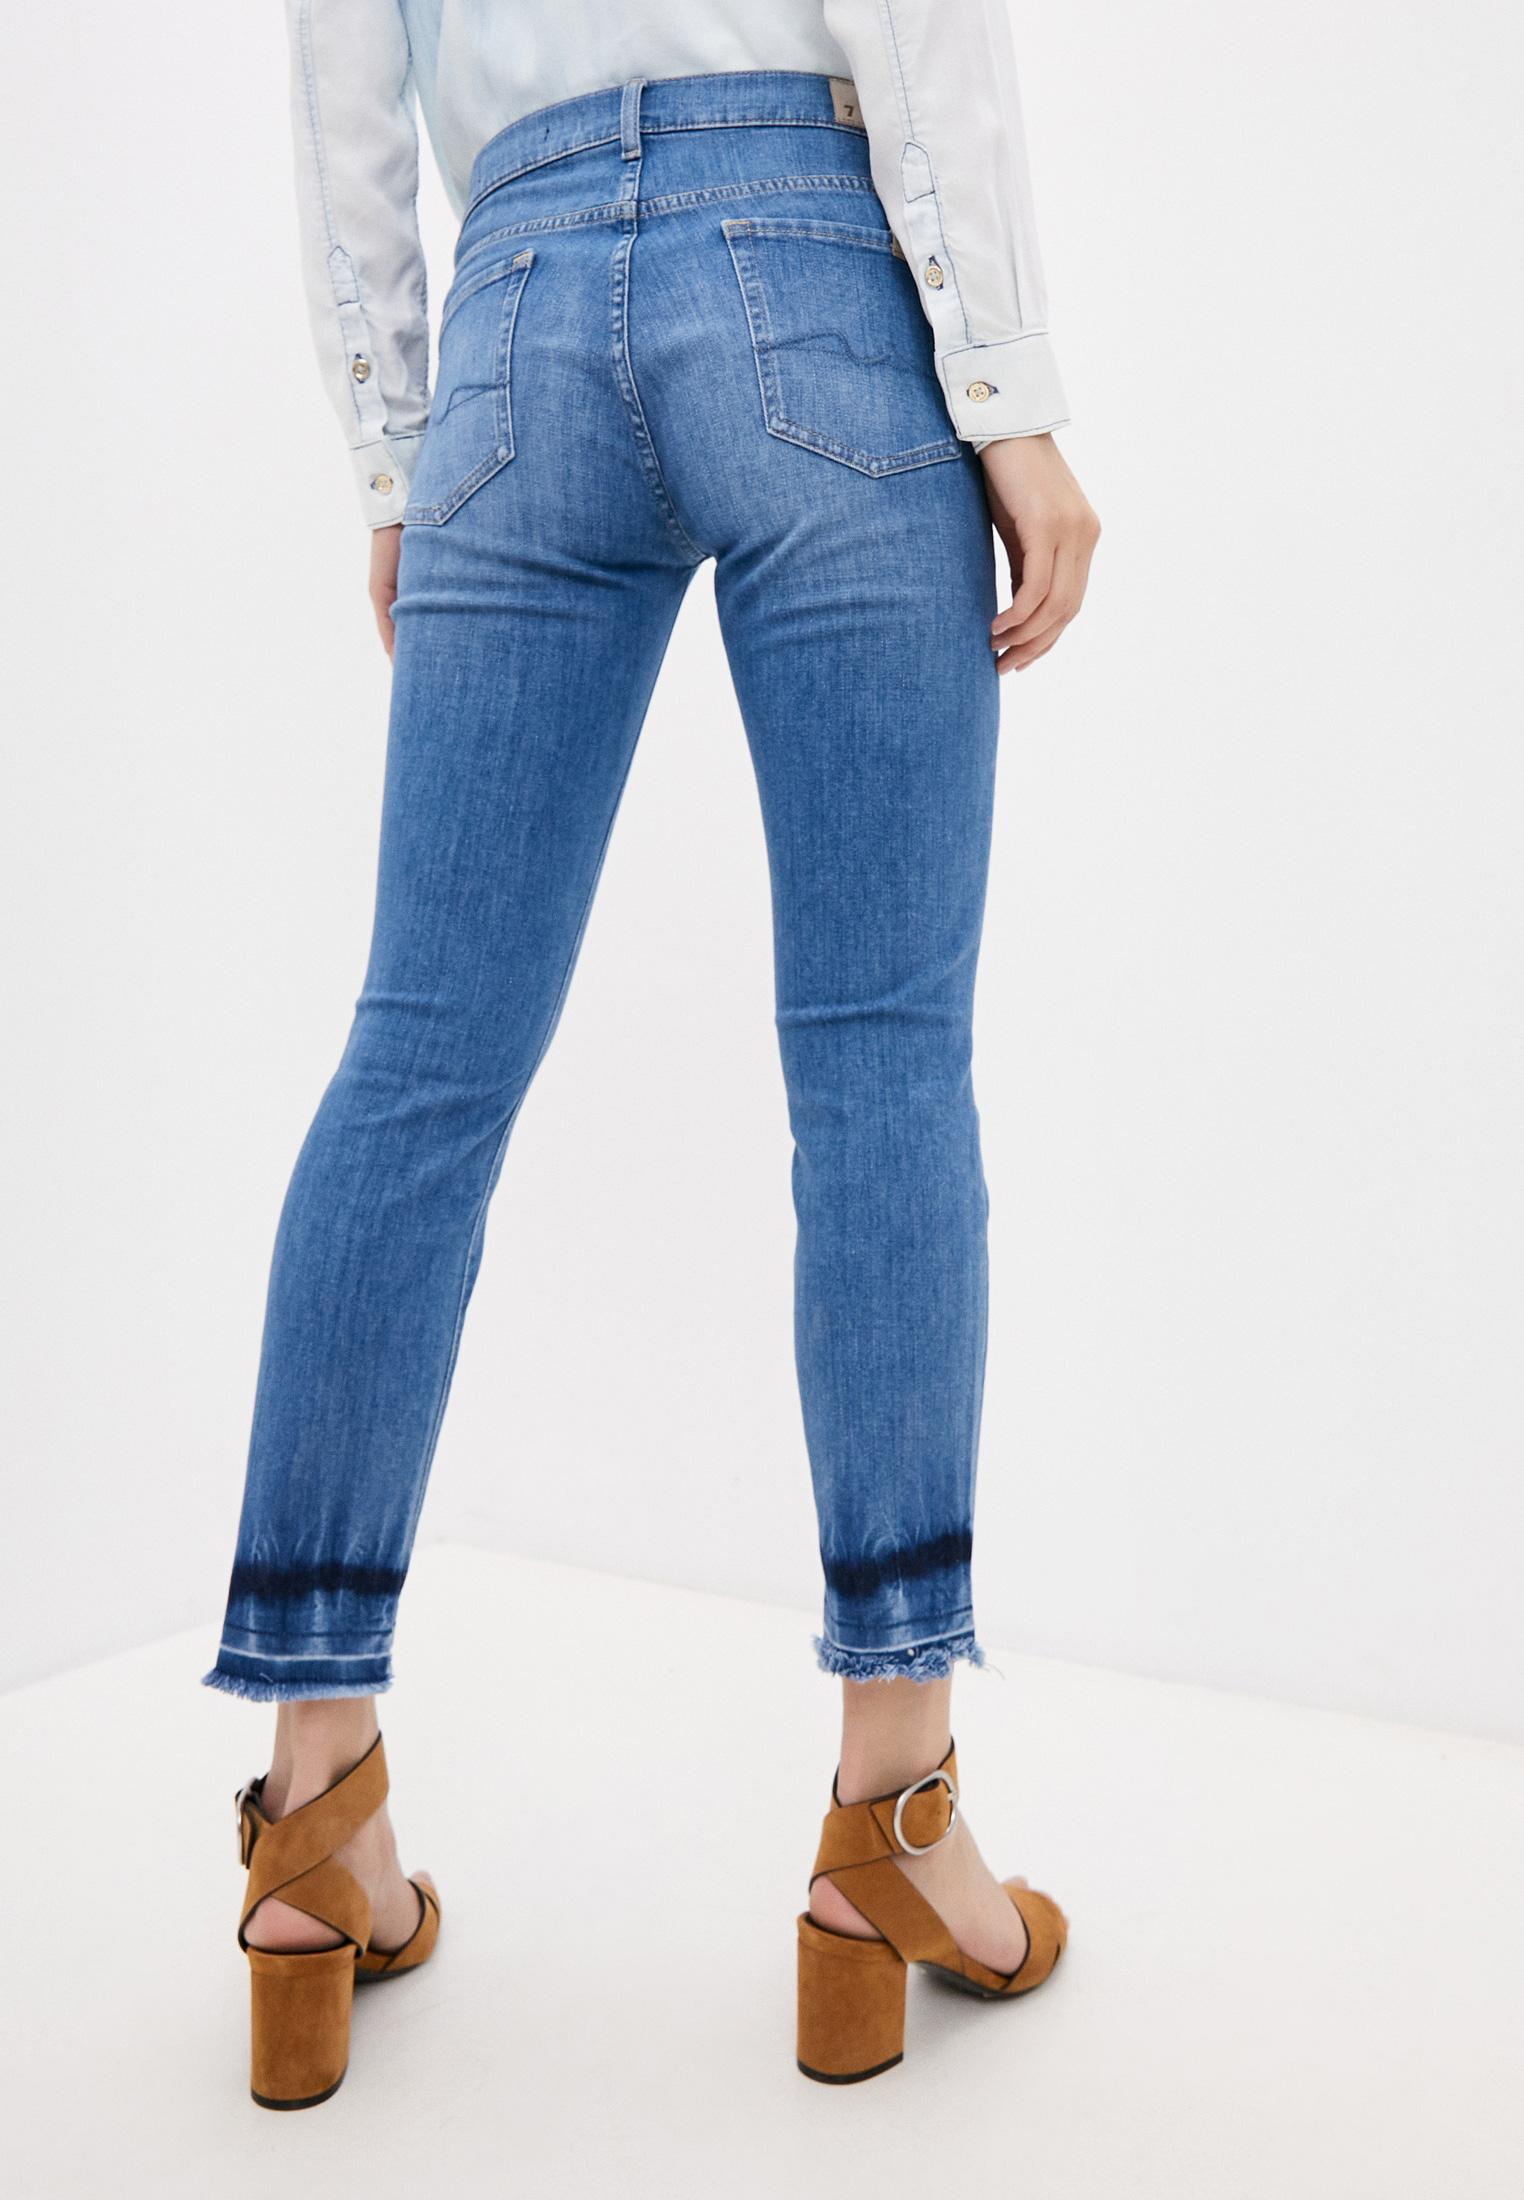 Зауженные джинсы 7 For All Mankind (7 Фо Олл Мэнкайнд) JSVYR51TRT: изображение 4